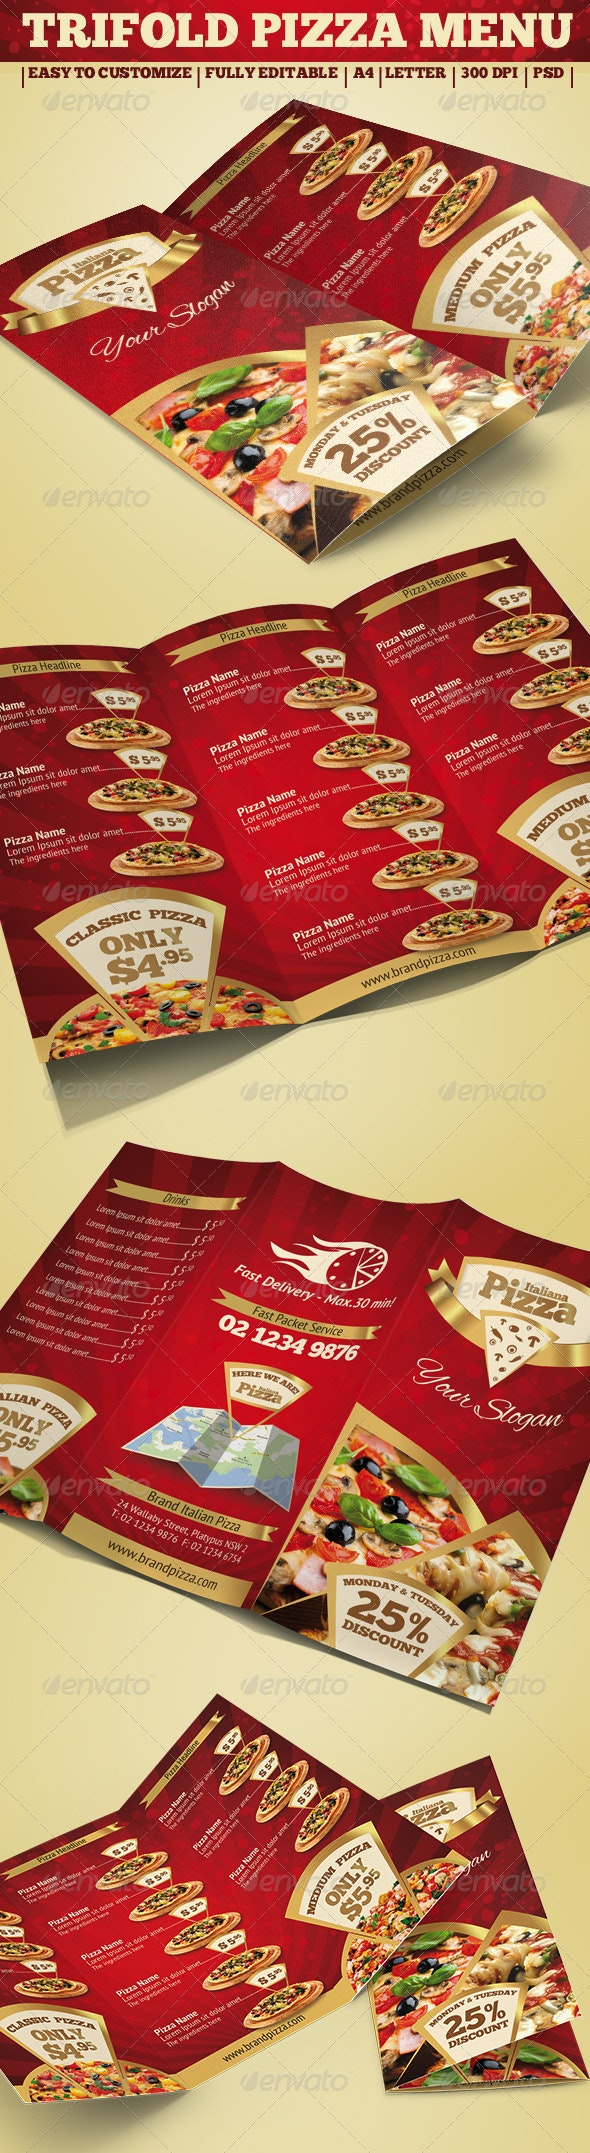 Trifold Brochure - Pizza Menu - Food Menus Print Templates